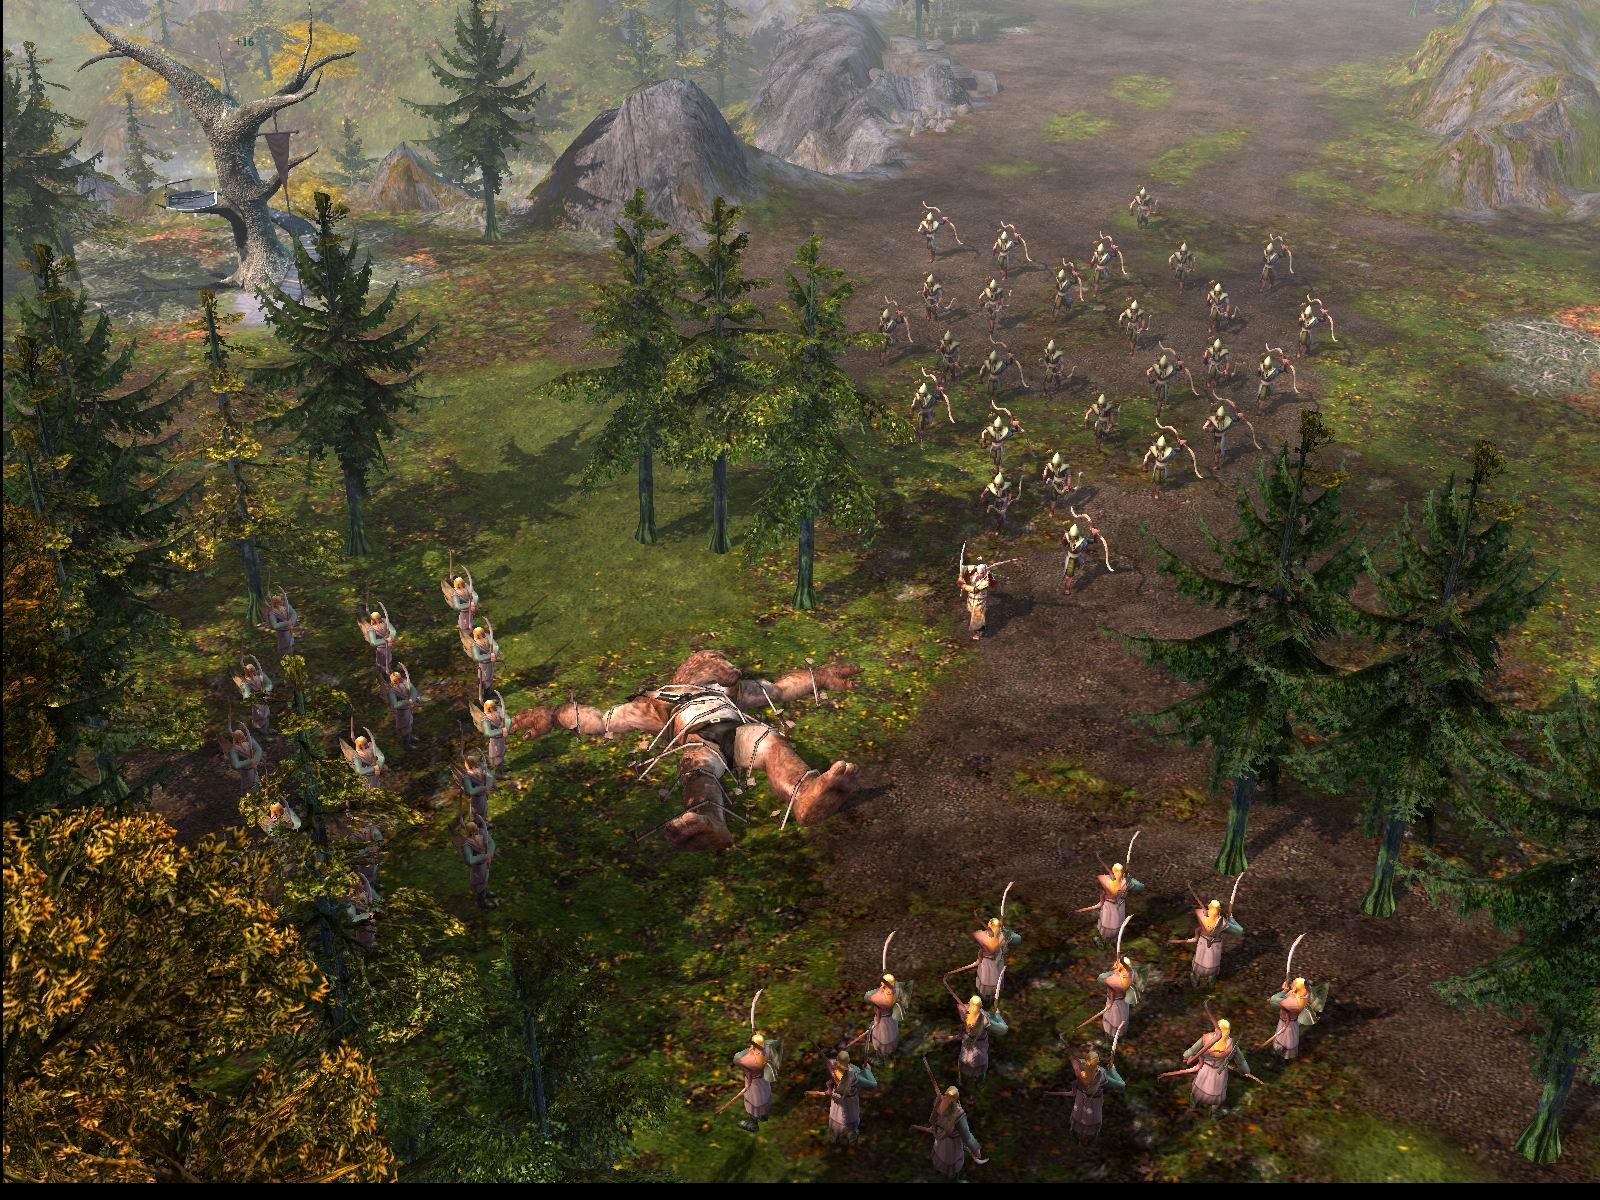 игра властелин колец война на севере торрент